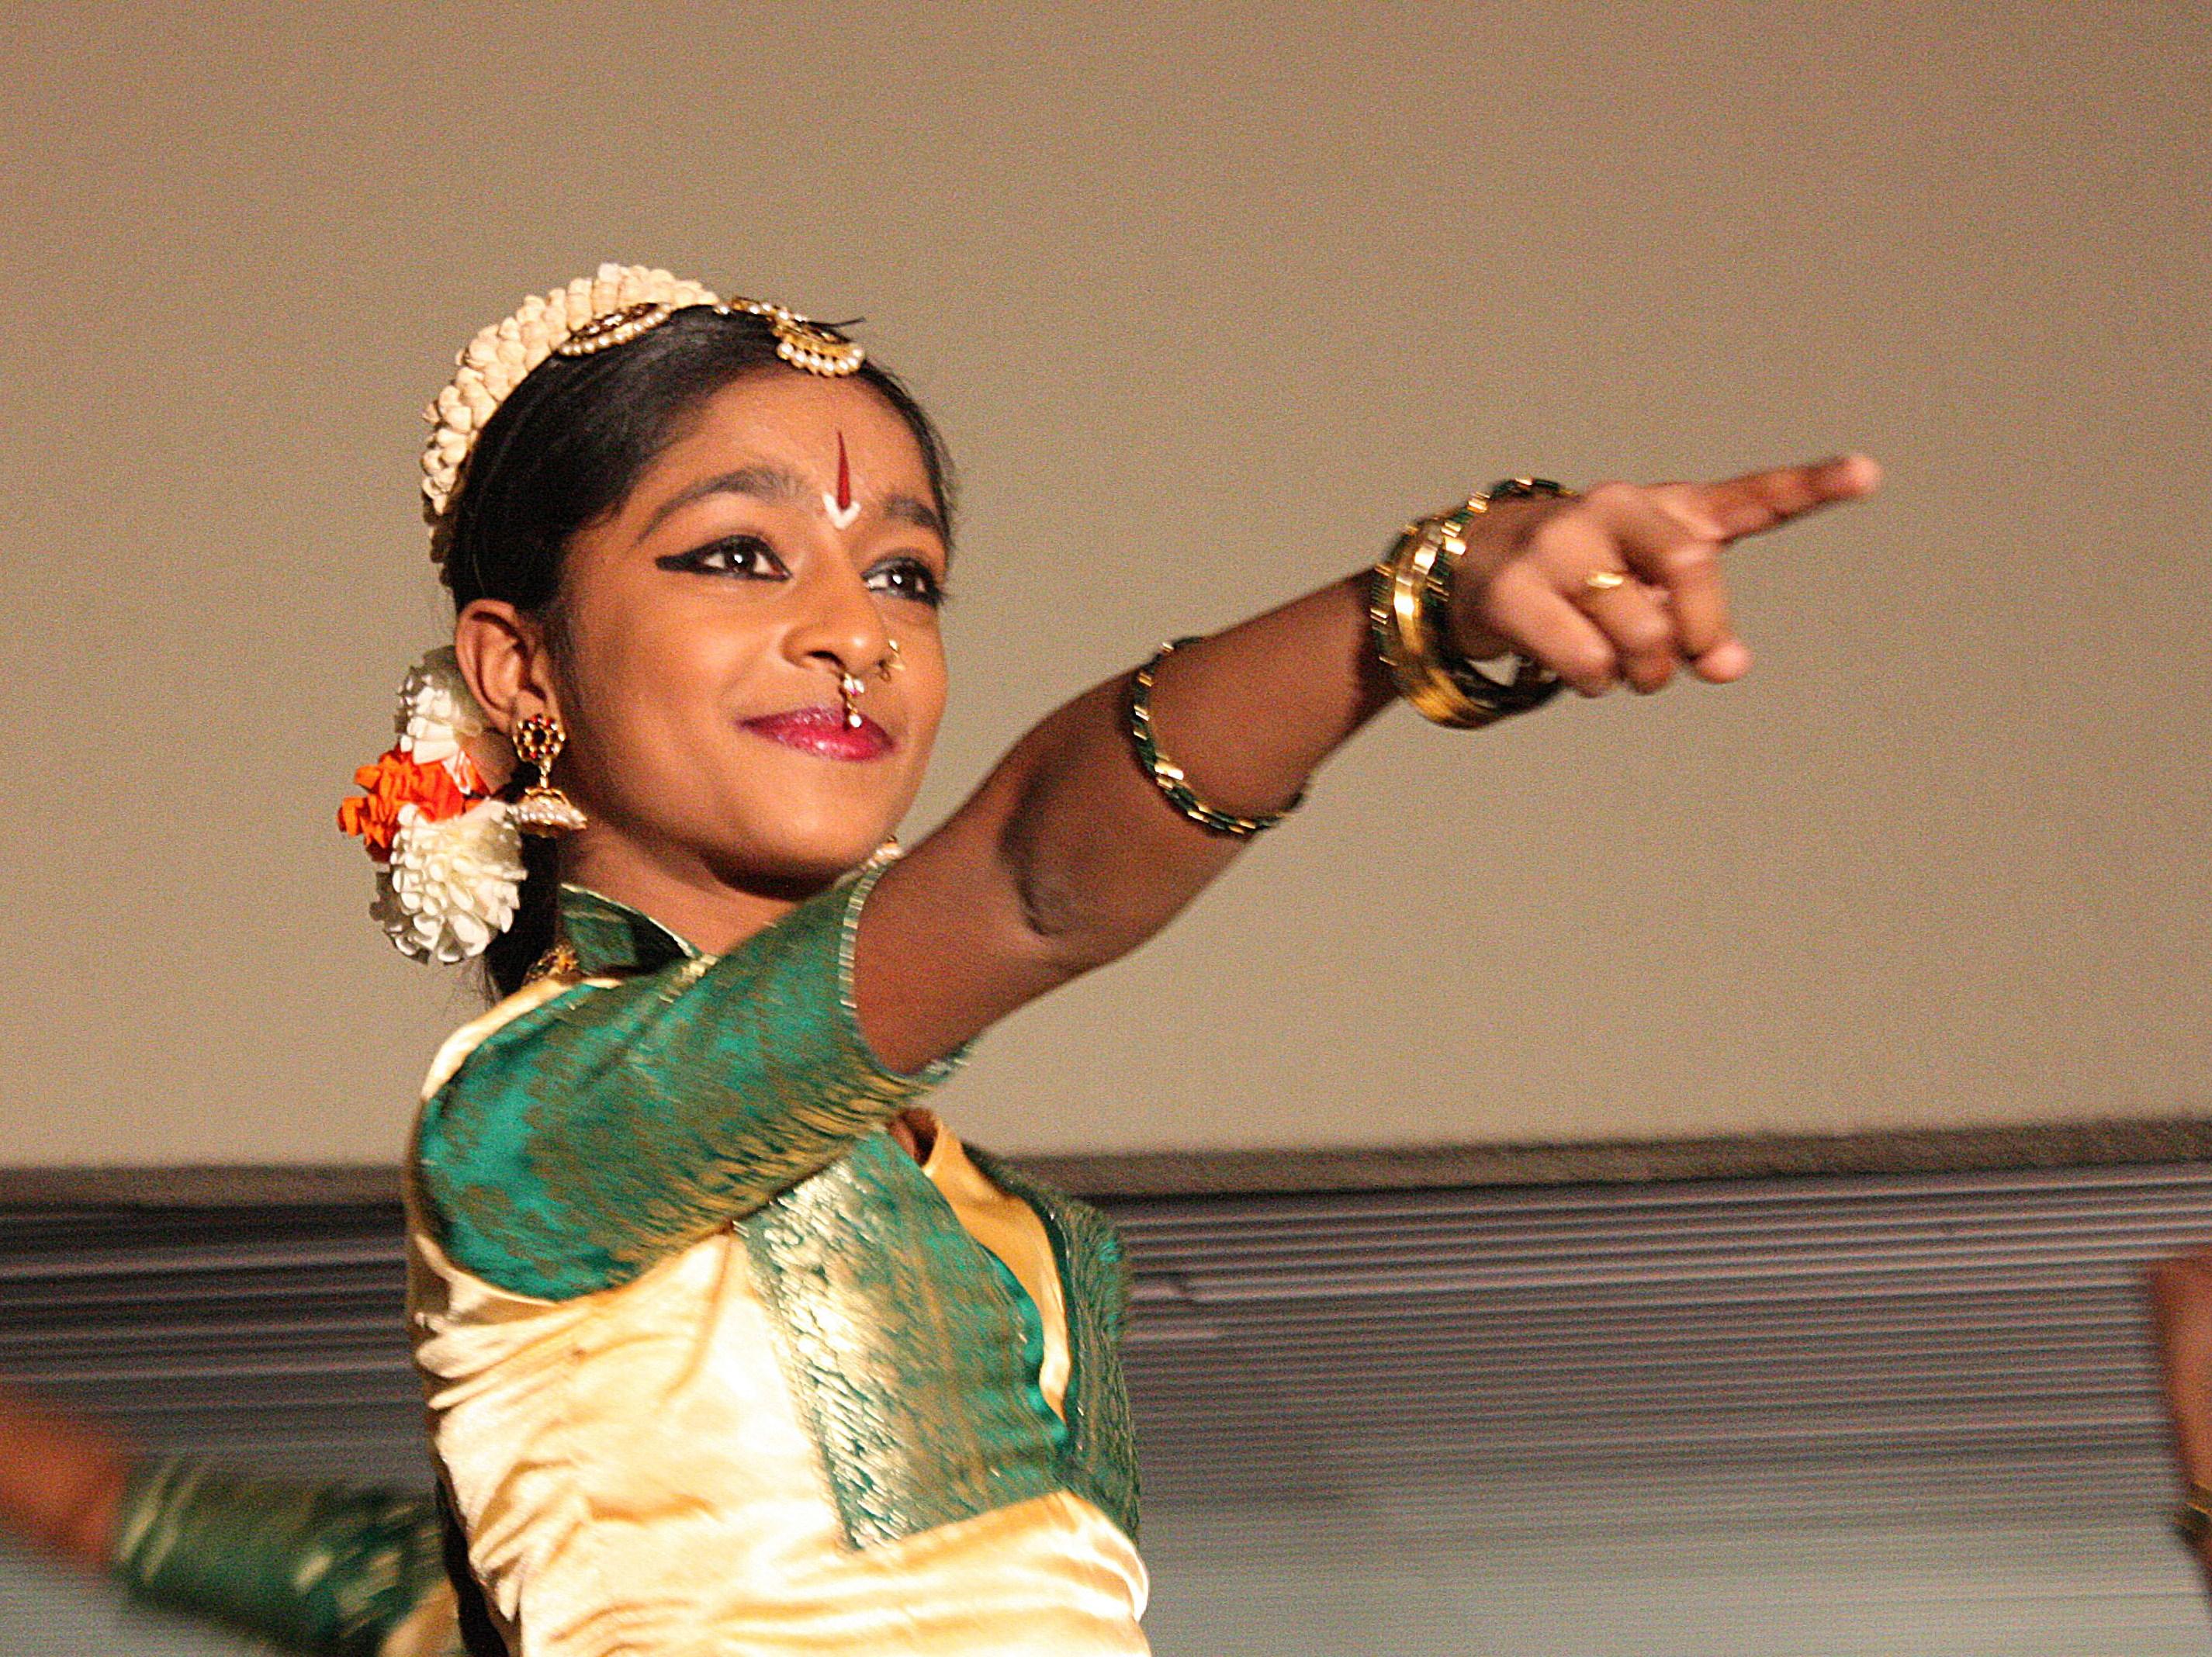 61. Tamil Harvest Festival